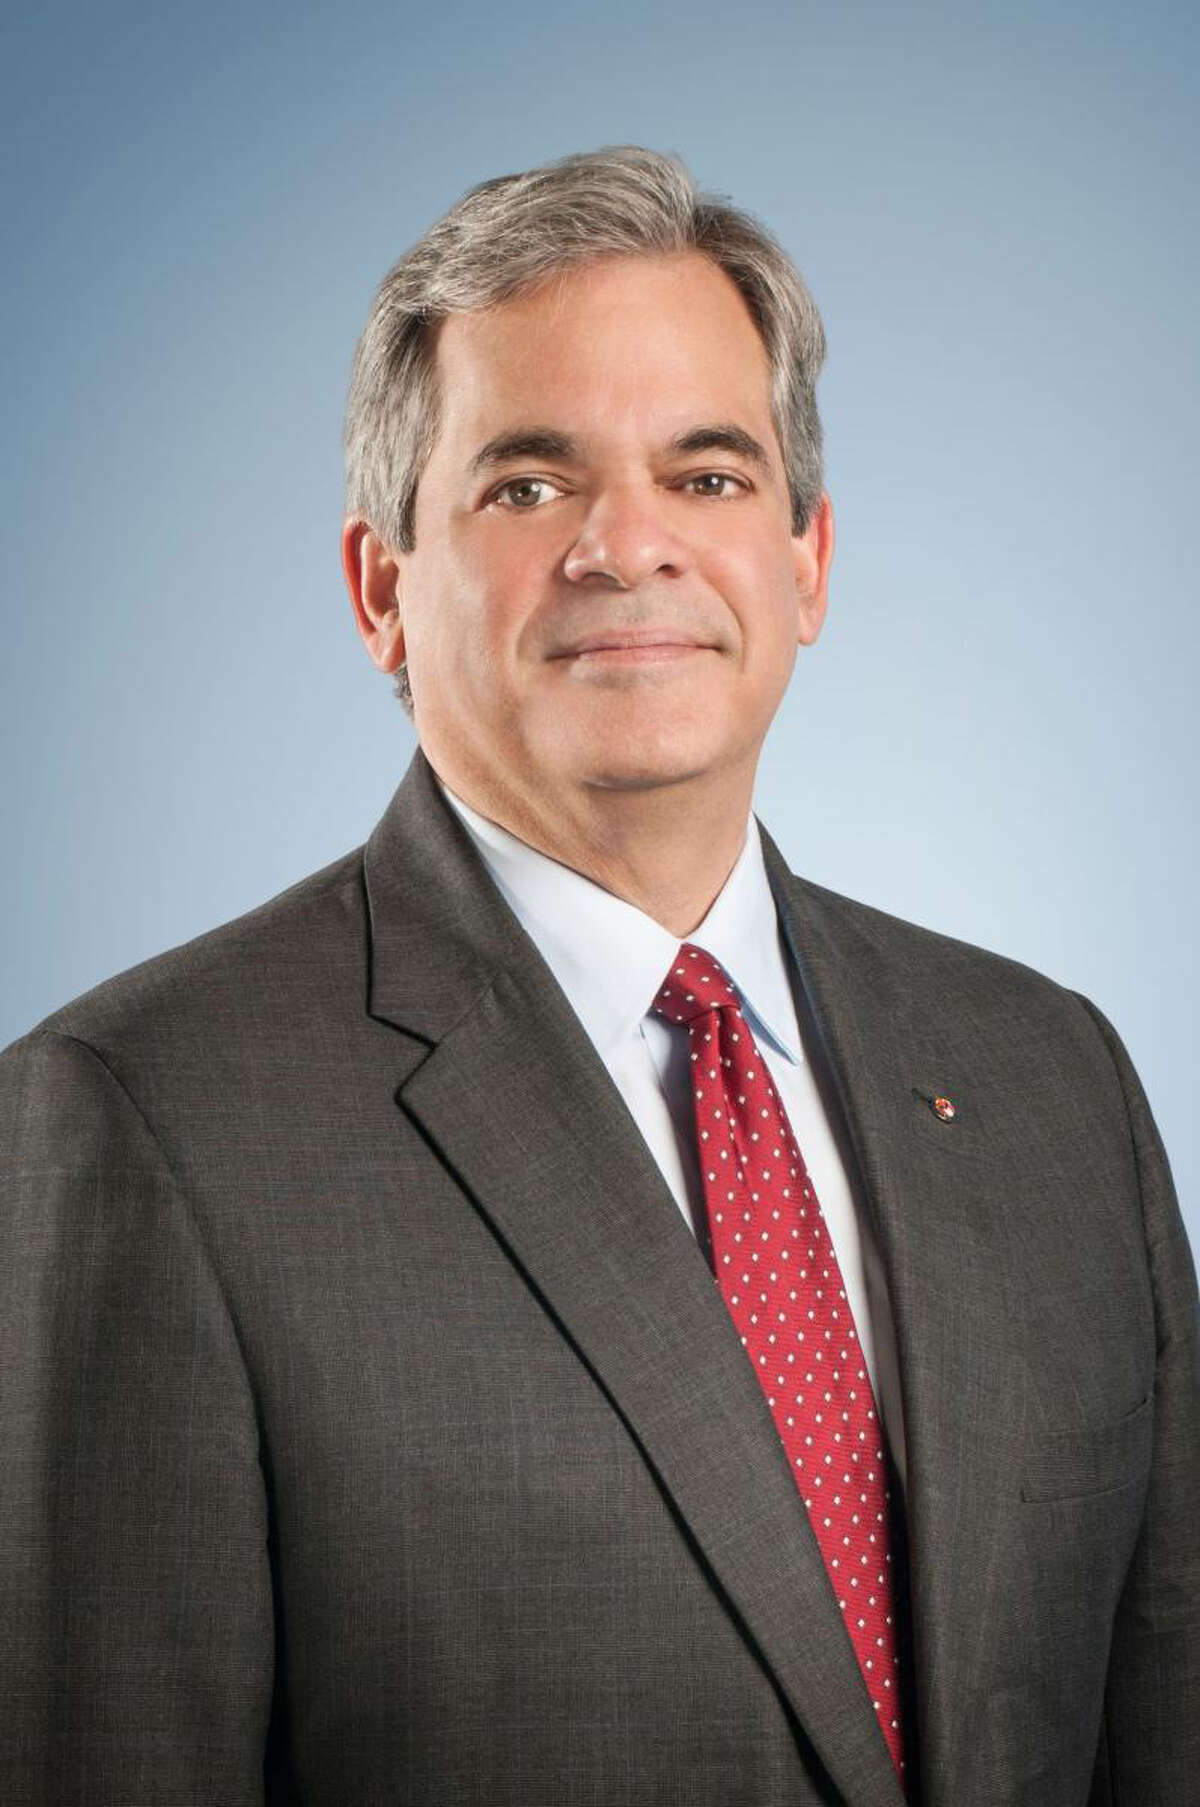 Austin Mayor Steve Adler: Thinks his city's breakfast tacos are better than San Antonio.